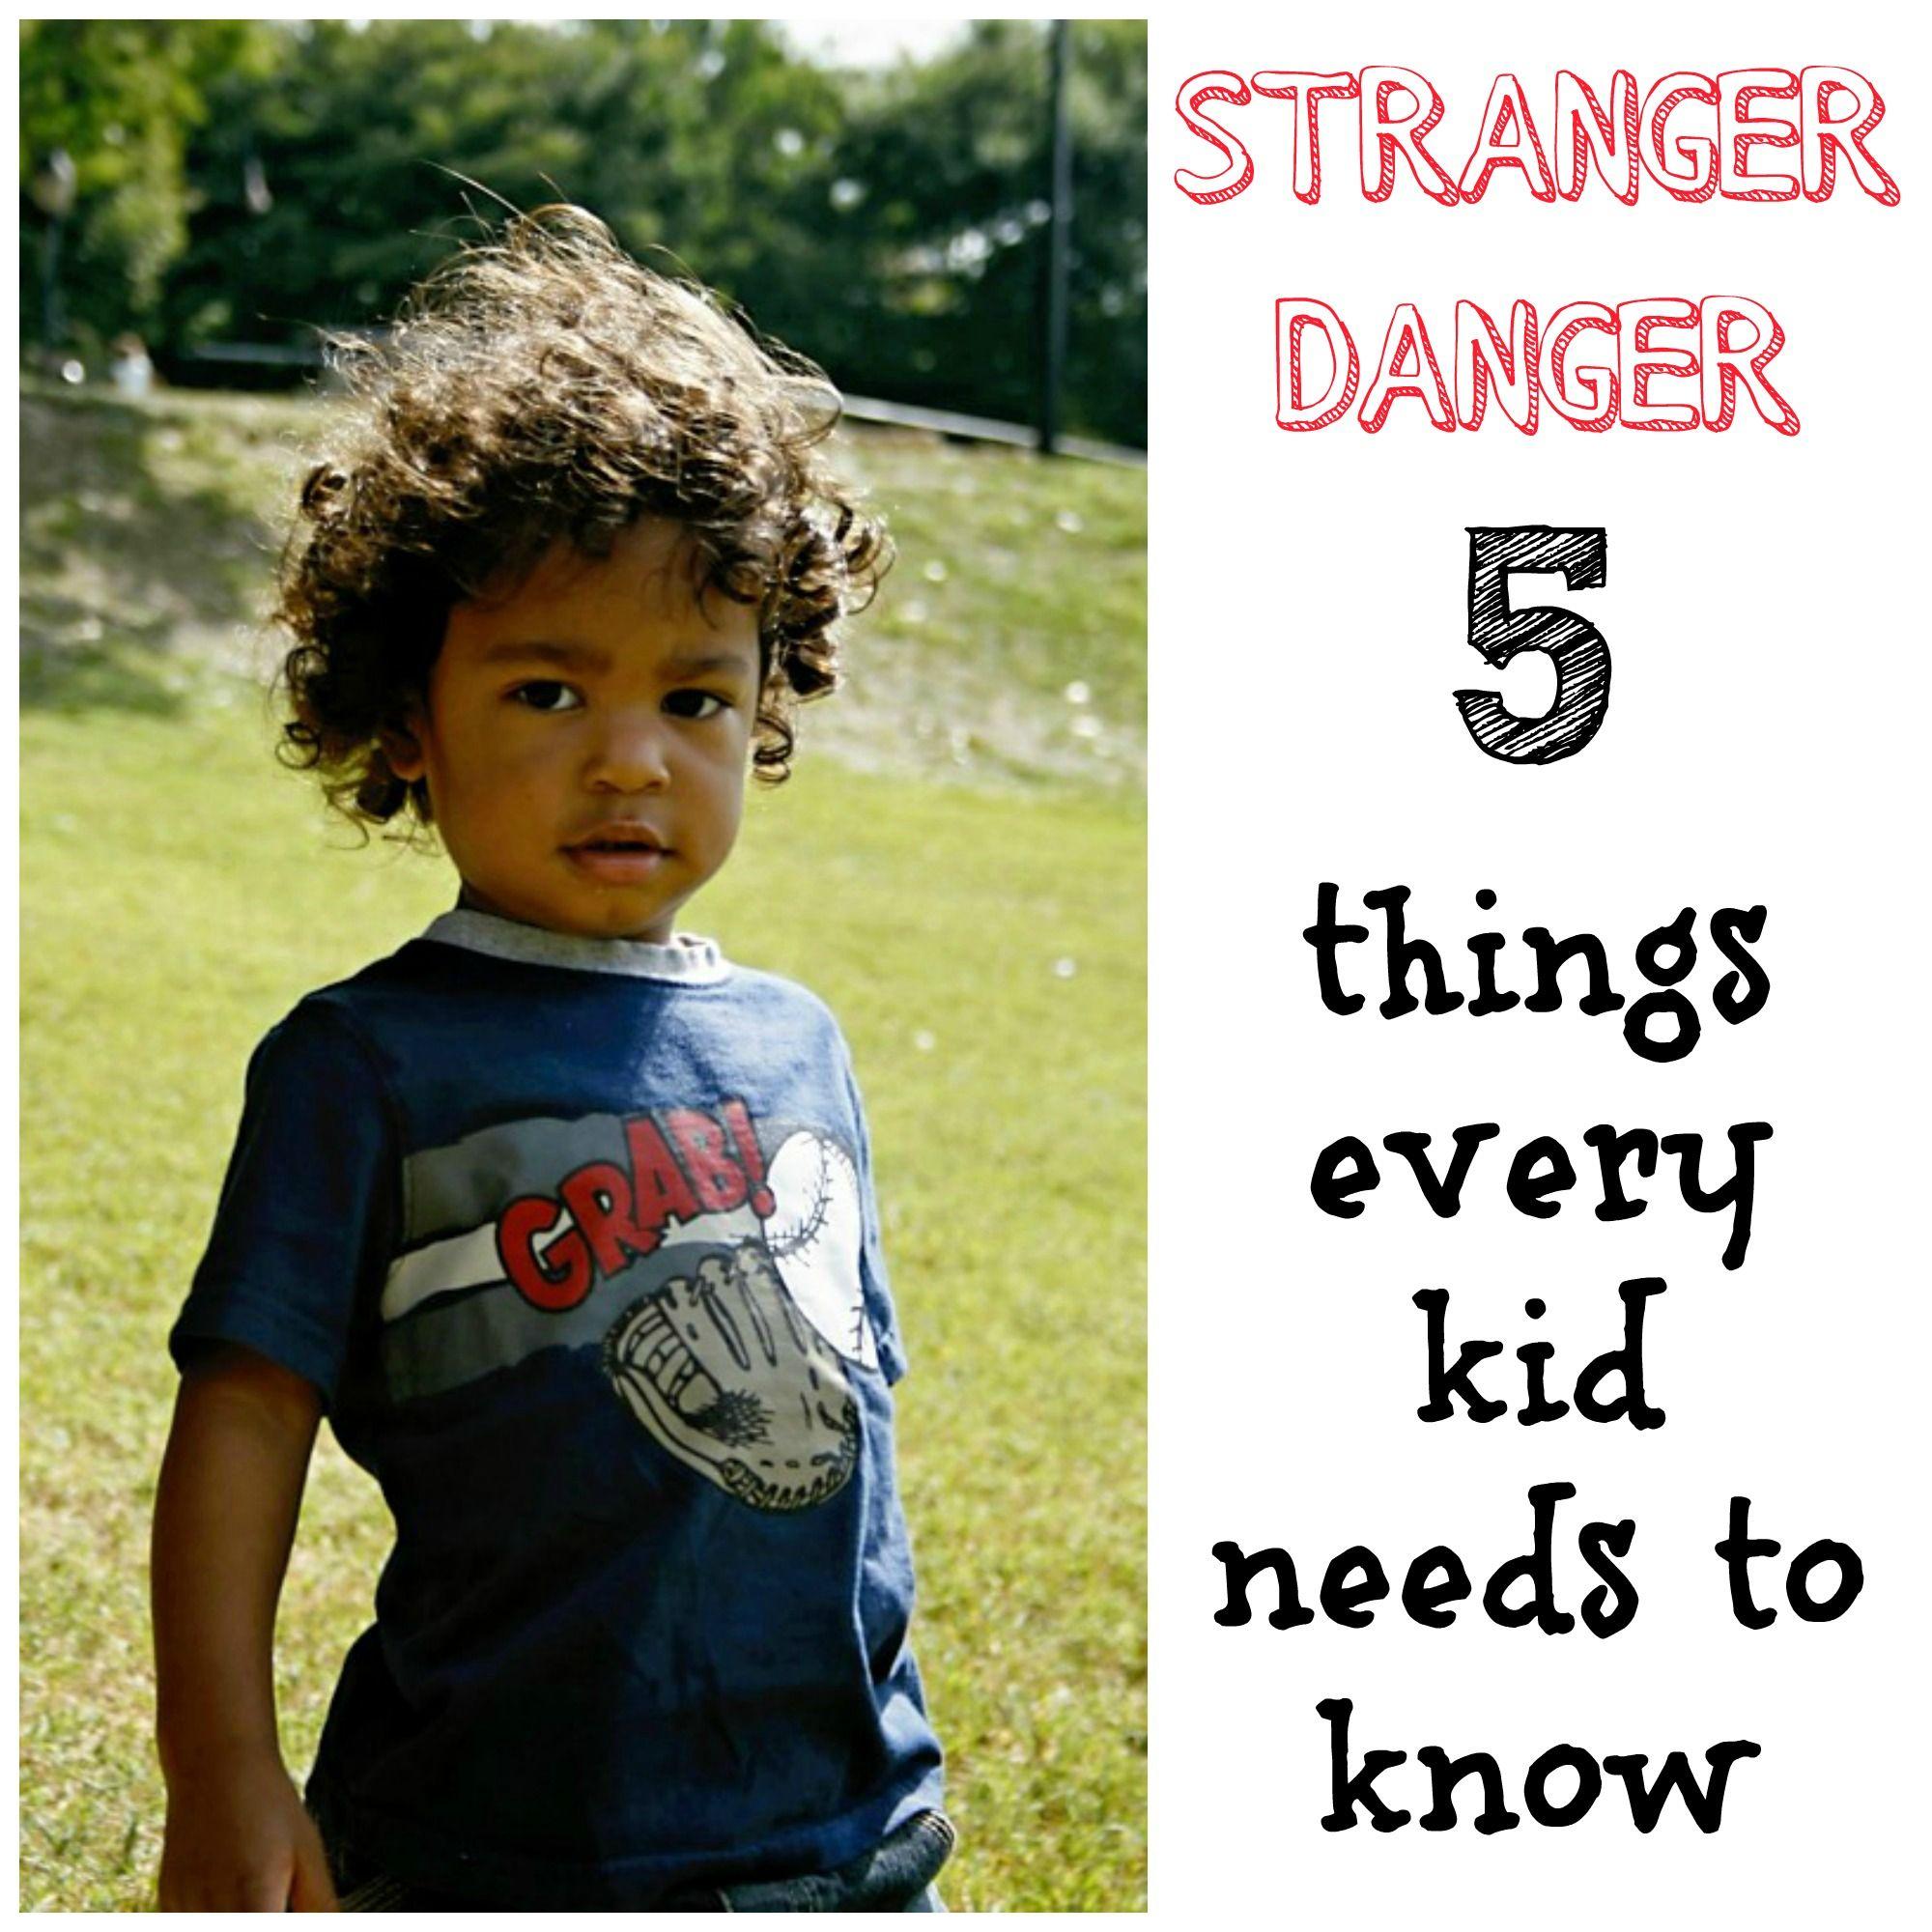 Stranger Danger What Every Parent Should Teach Their Kids